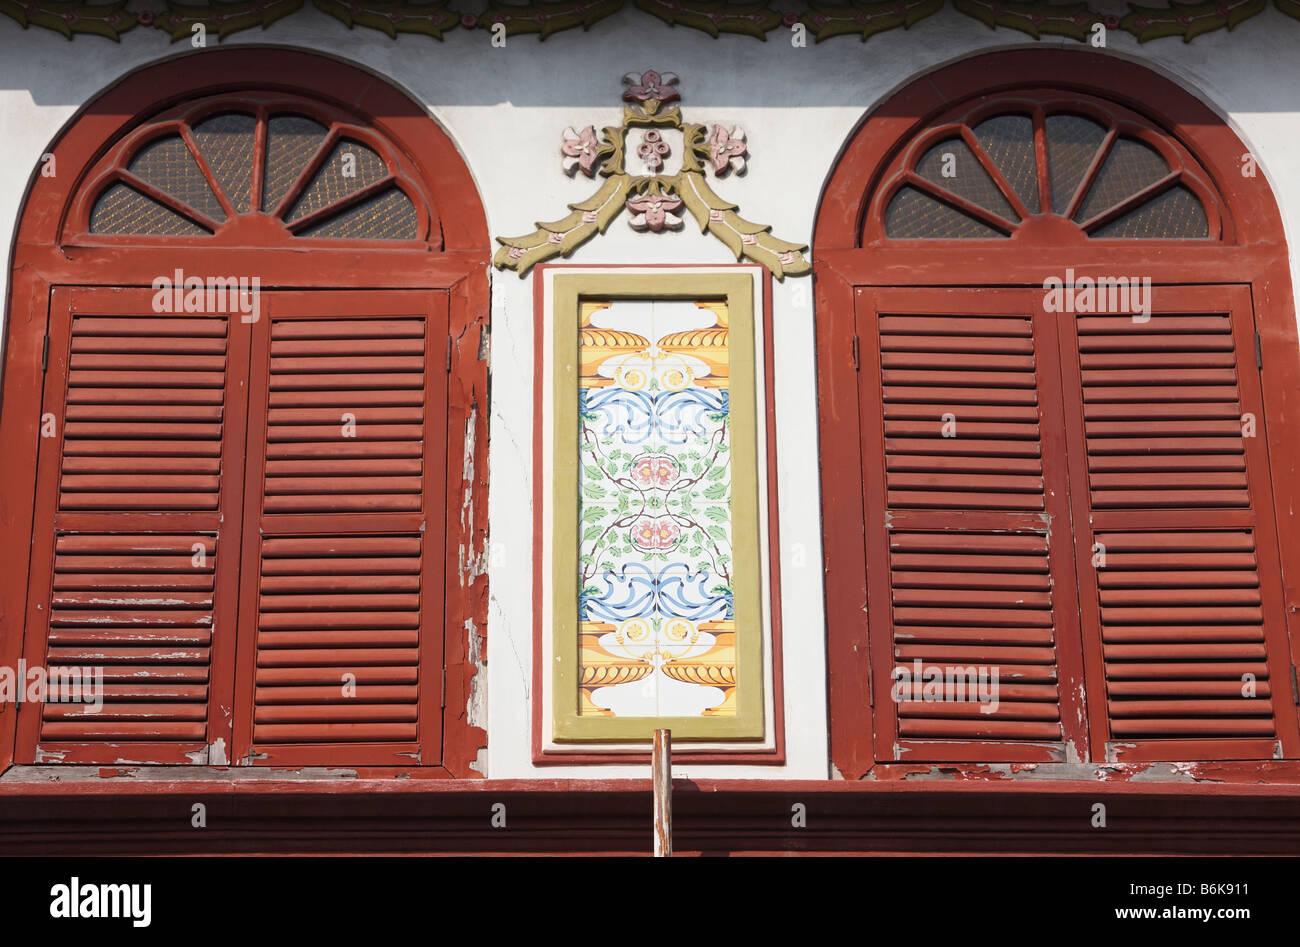 Shuttered Windows Of Renovated Peranakan Building, Melaka - Stock Image